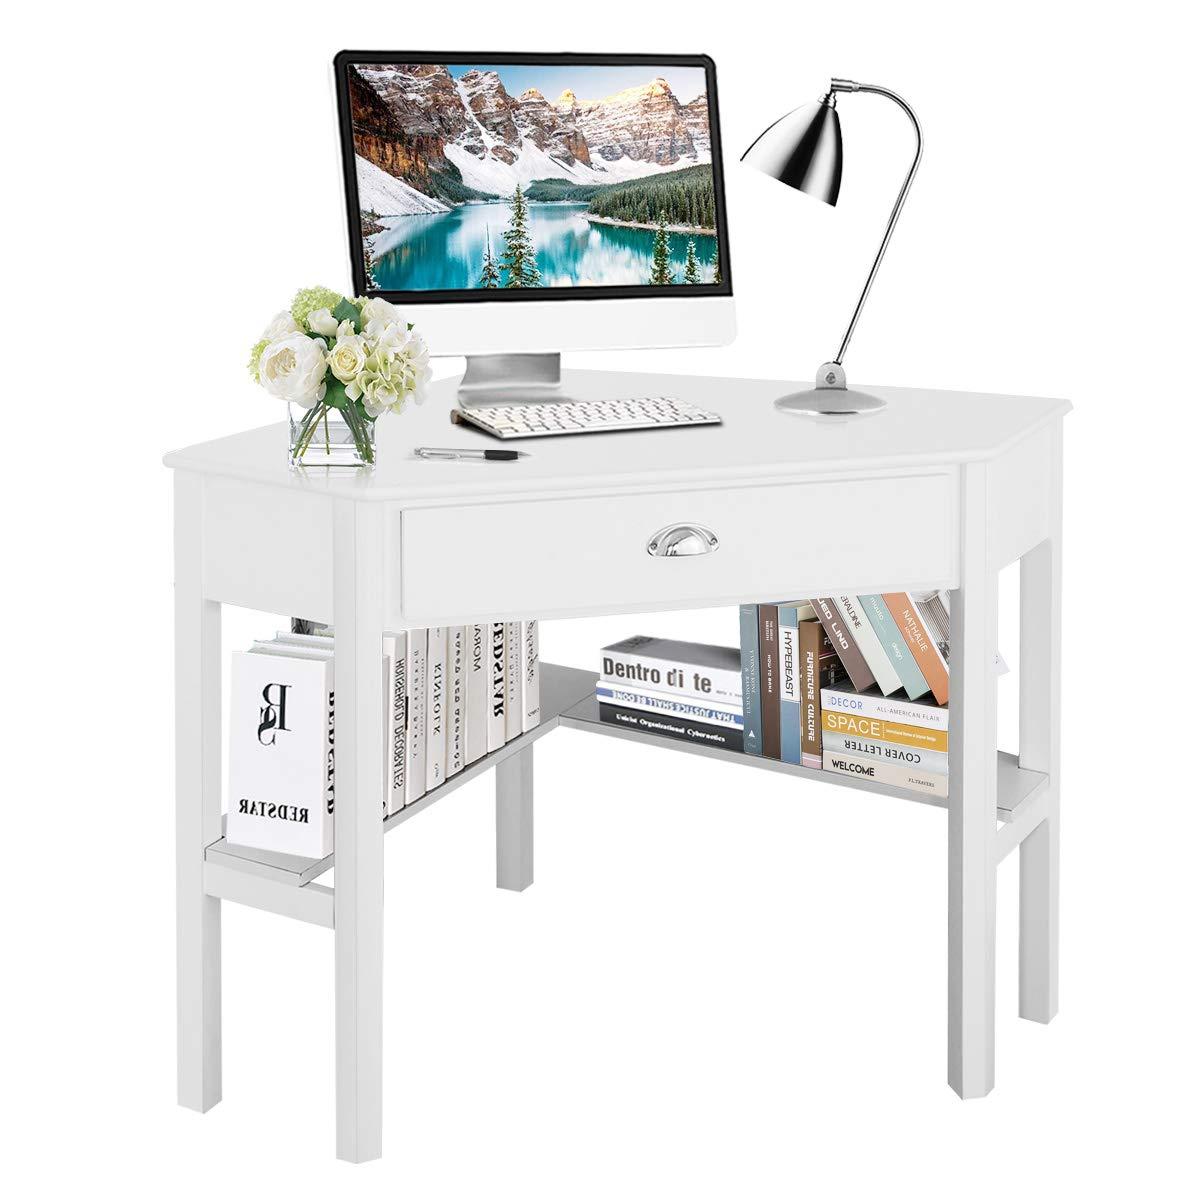 Corner Computer Desk Workstation with Storage Drawer /& Shelves Tangkula Corner Desk Wood Compact Home Office Desk Laptop PC Table Writing Study Table